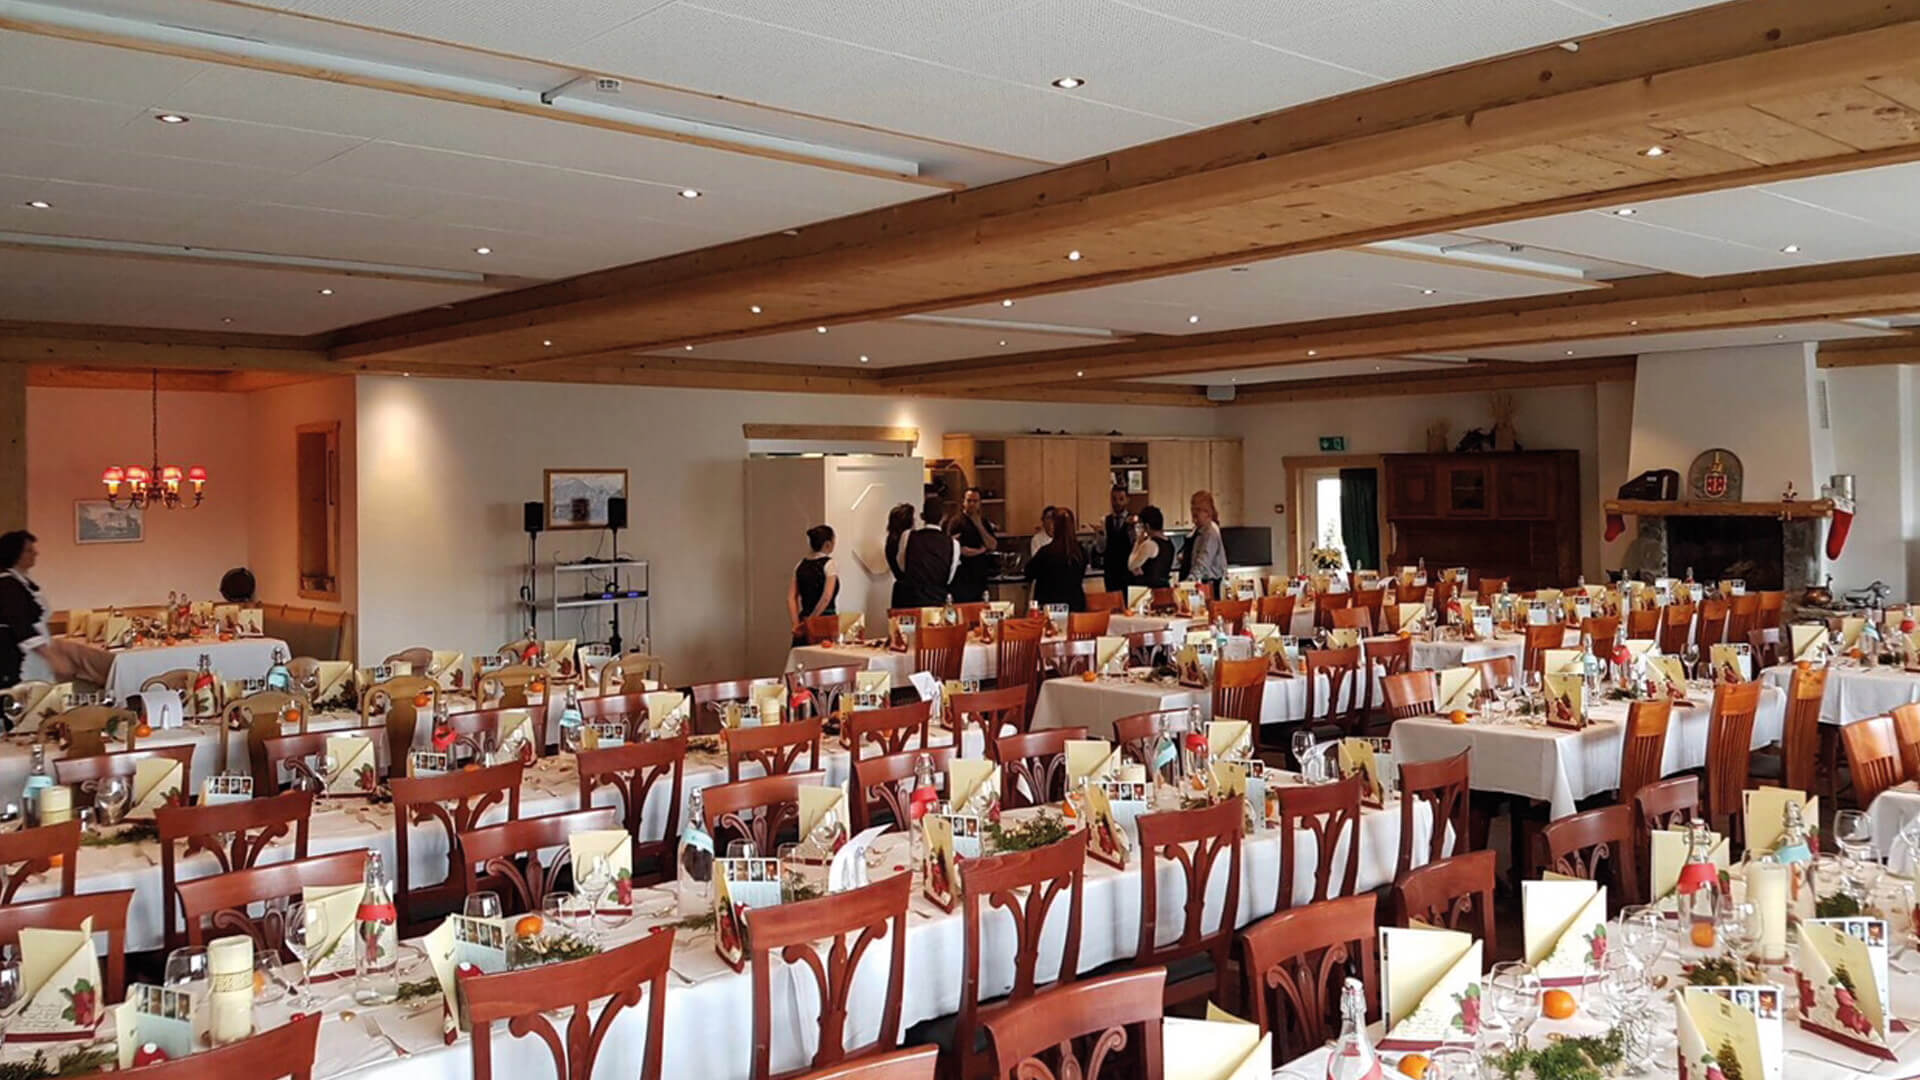 carlton-europe-hotel-speisesaal